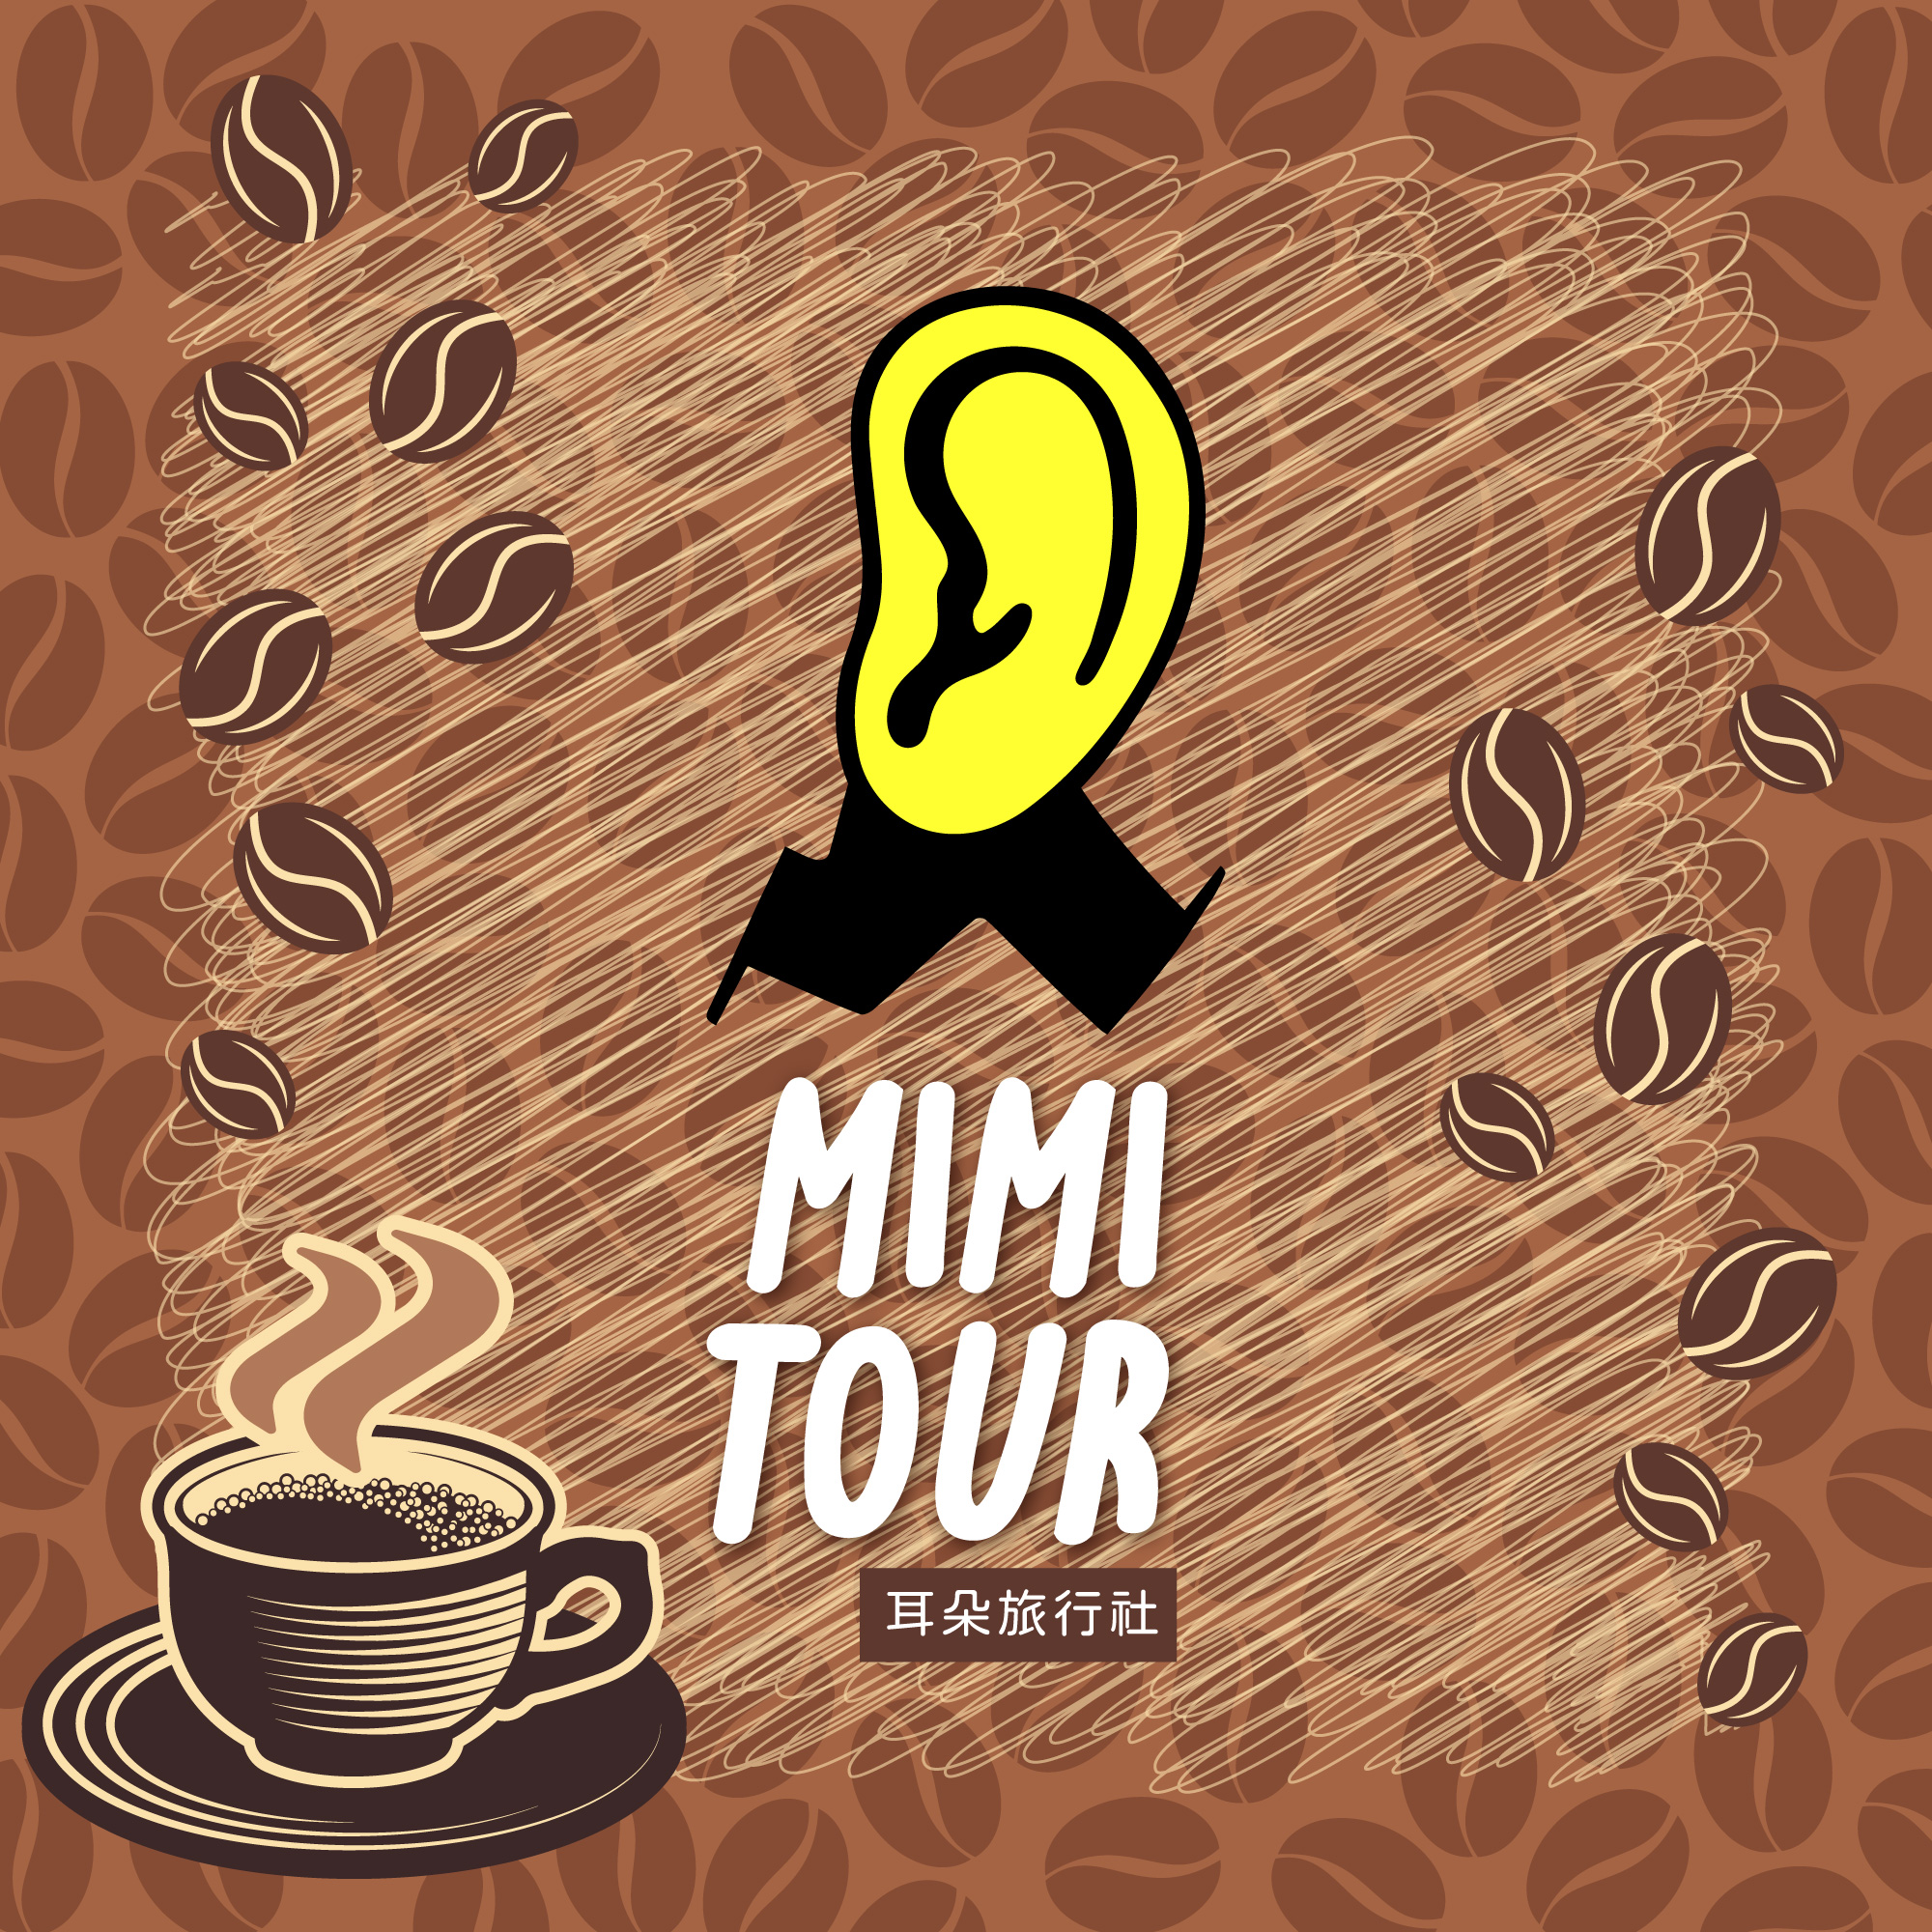 【S2/E40】祖安:茶啡聽2.聊韓國咖啡廳的小耳朵